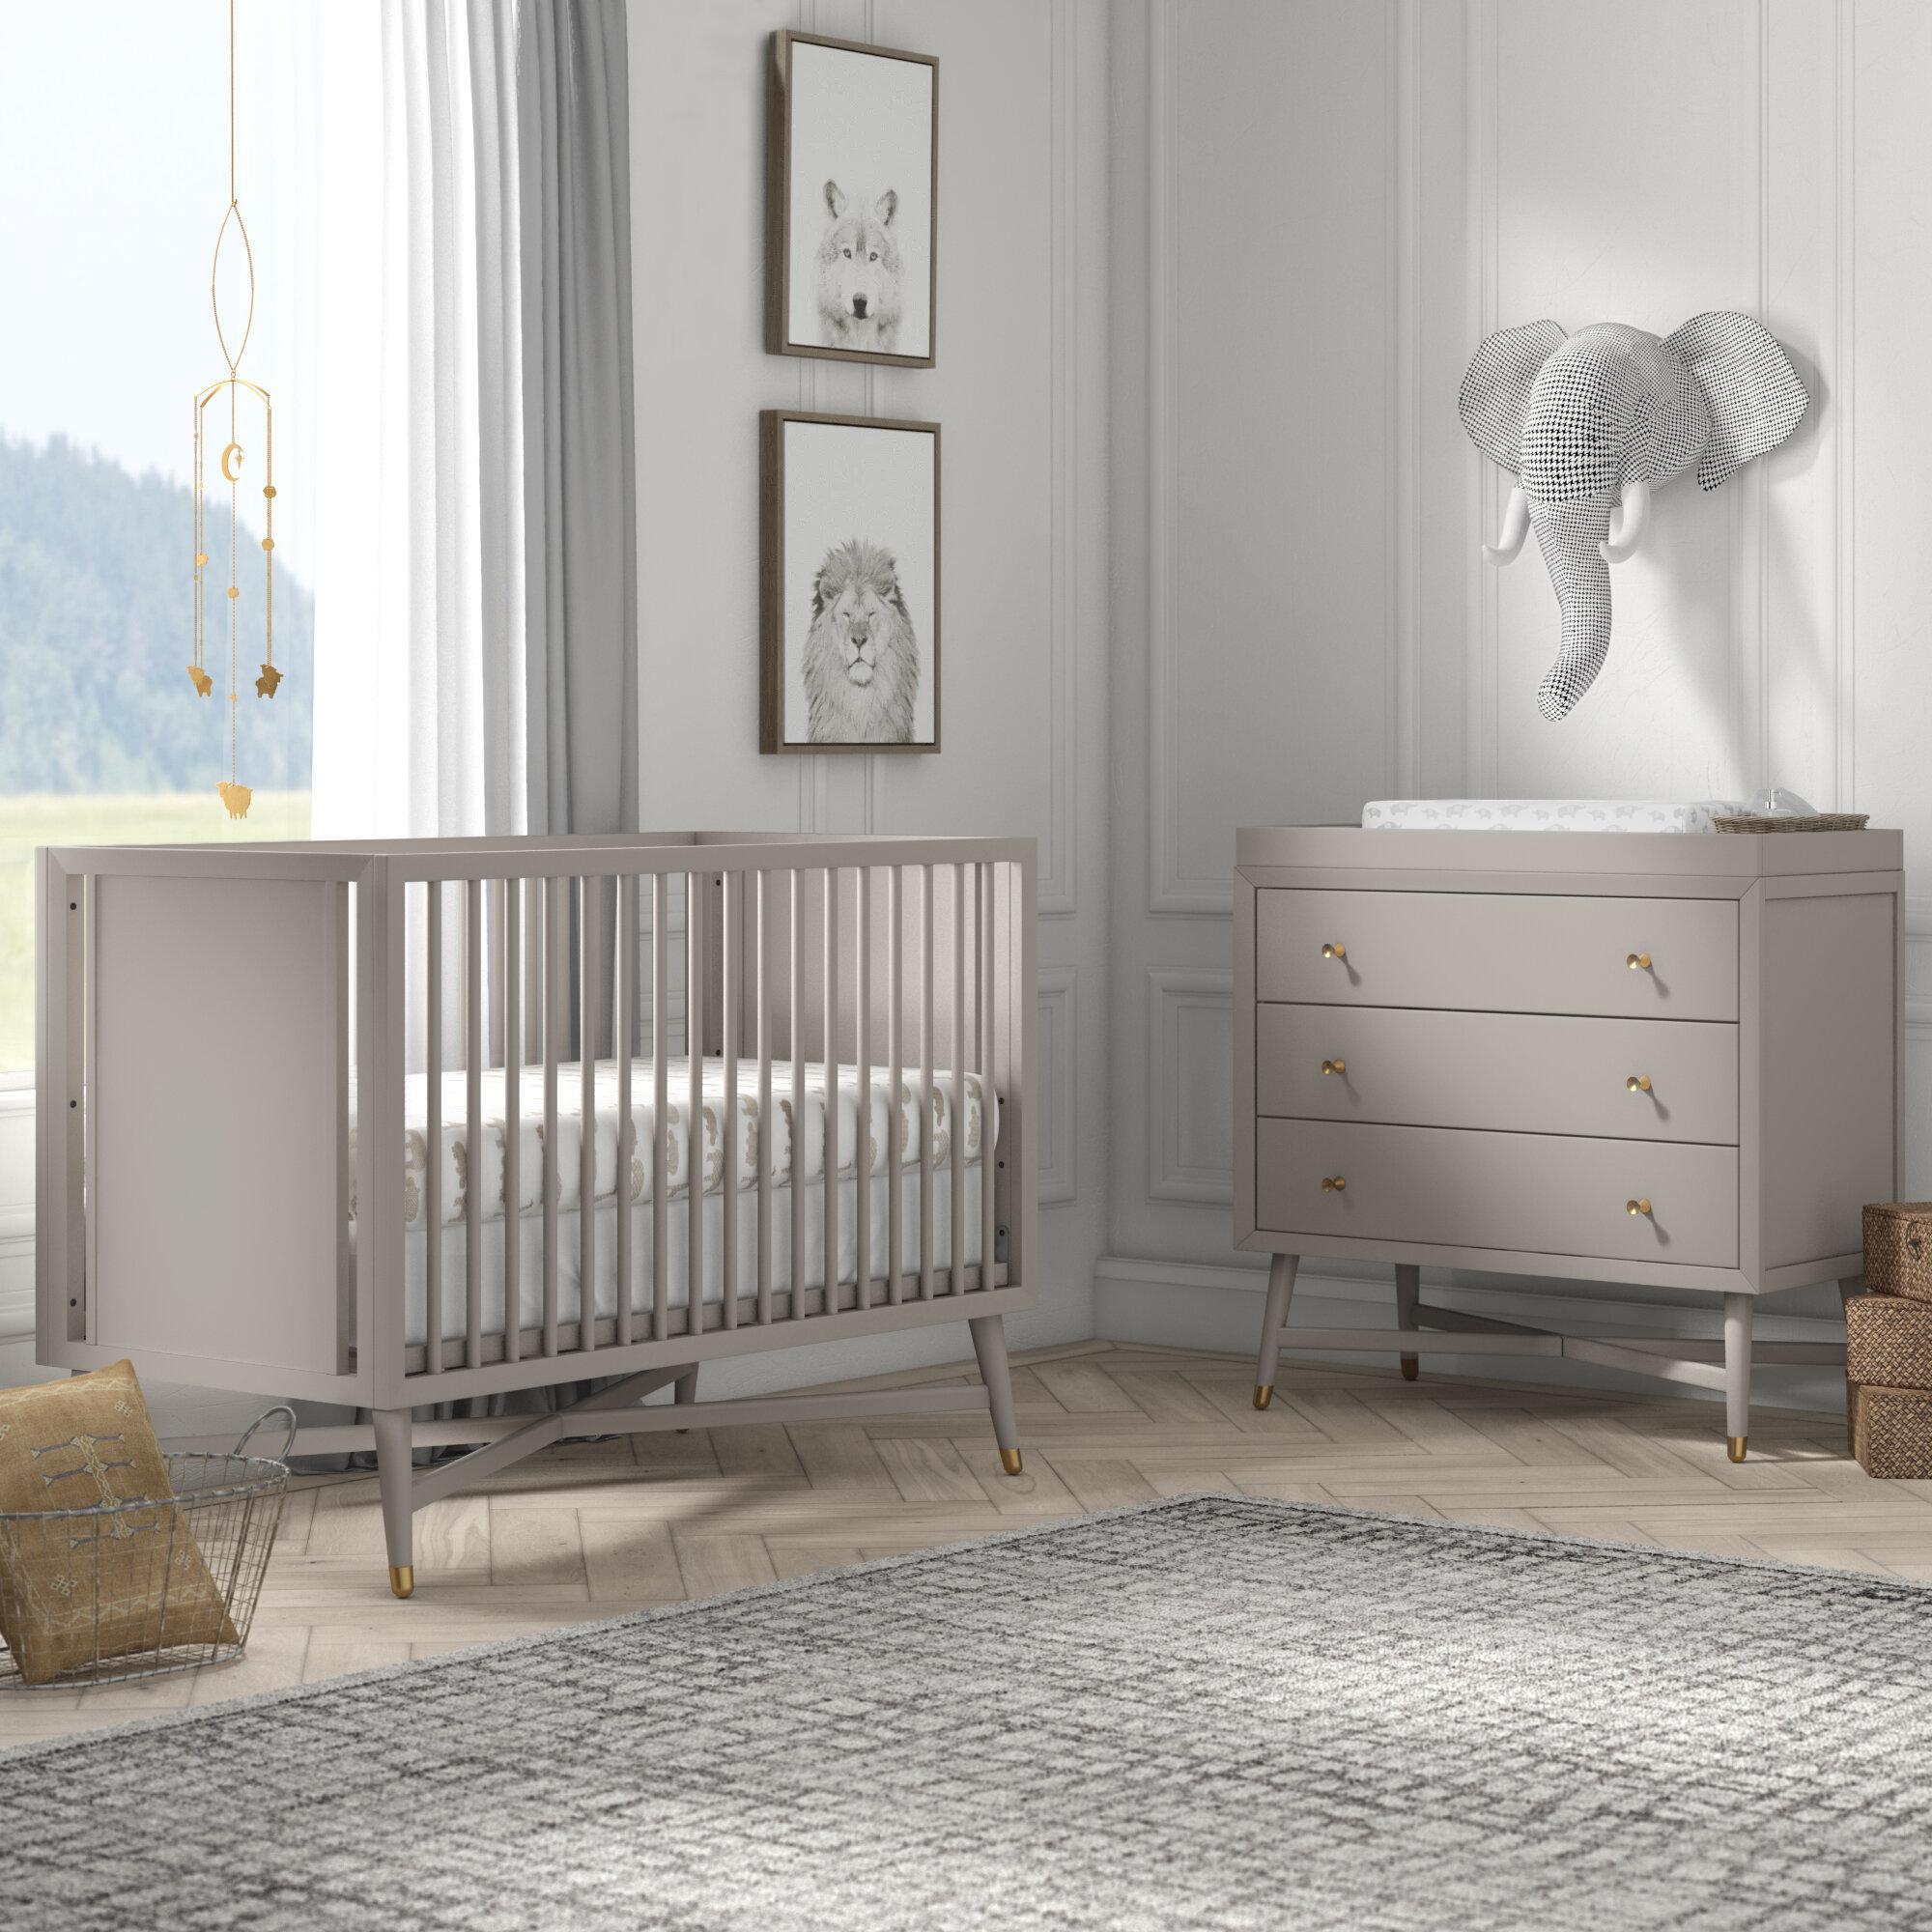 Mcpartland Mid Century 3 In 1 Convertible Standard 2 Nursery Furniture Set